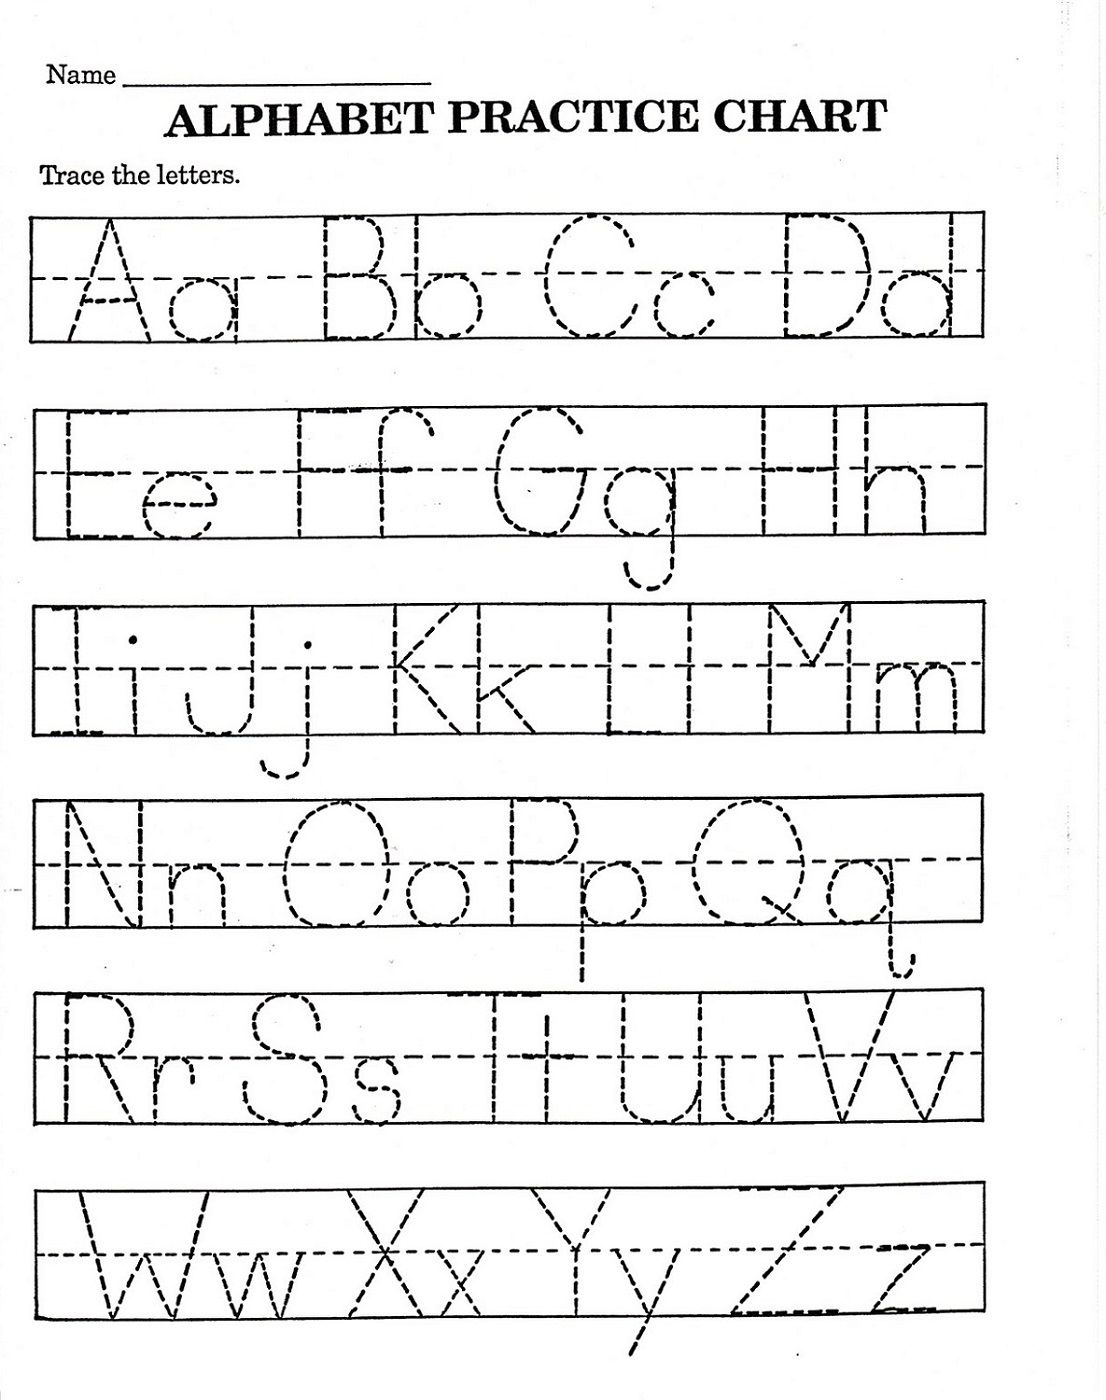 Free Printable Letter Worksheets For Preschoolers For You - Math - Free Printable Letter Worksheets